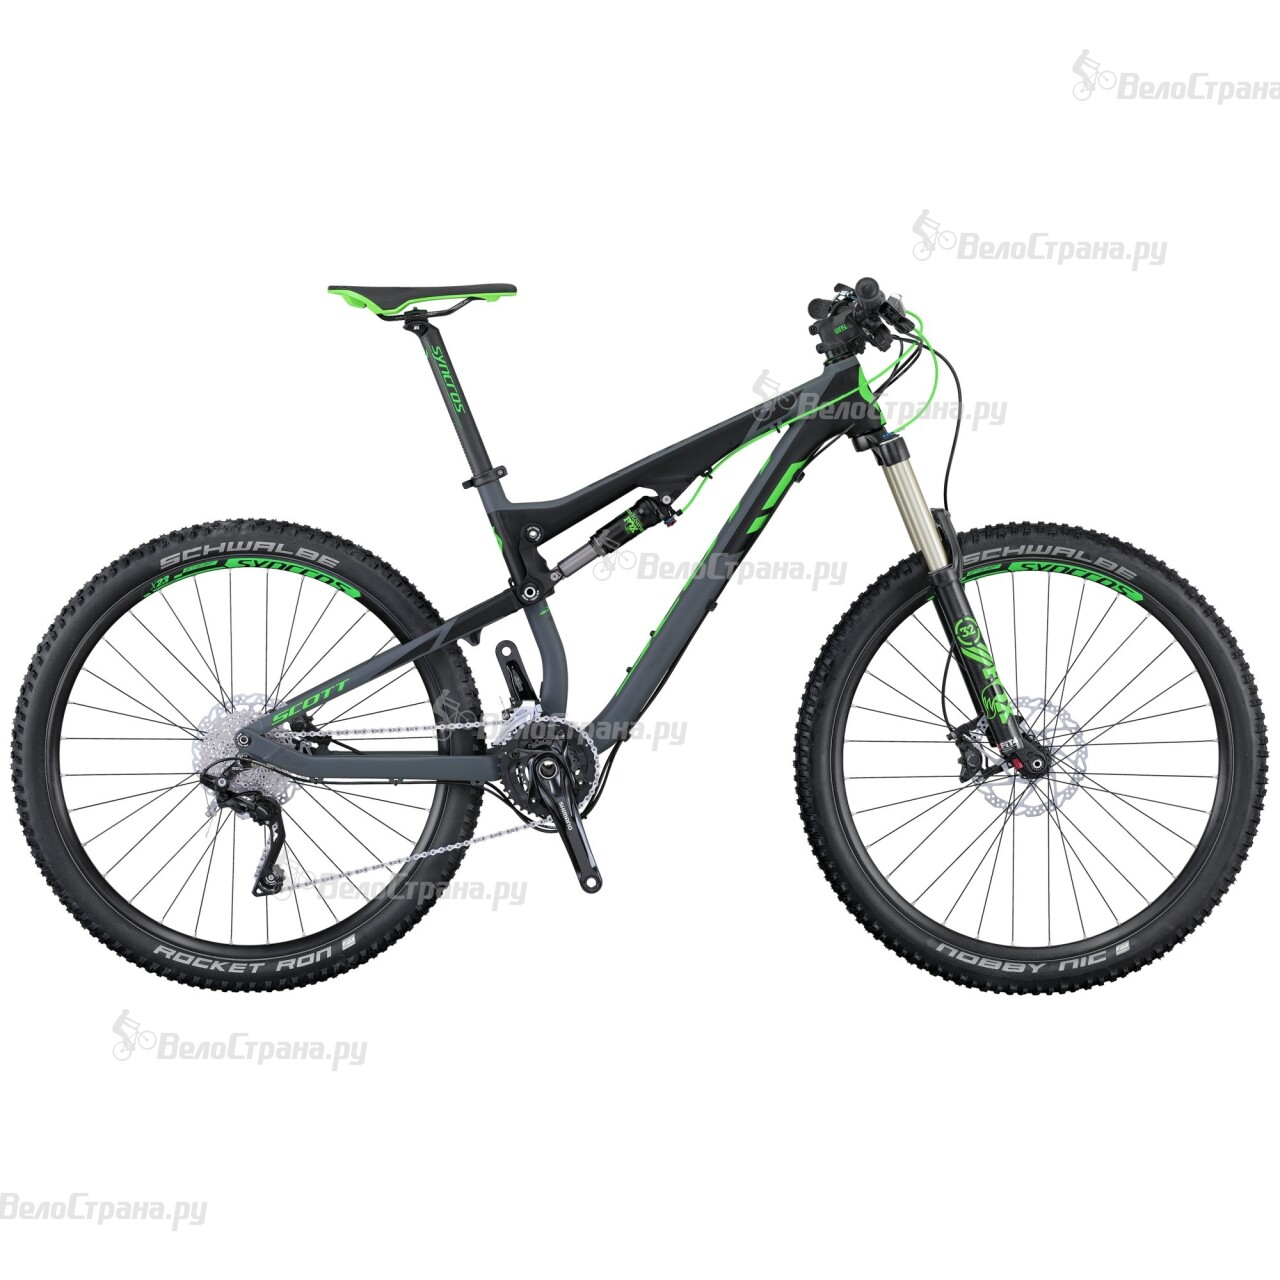 Велосипед Scott Genius 740 (2016) genius hs 300a silver